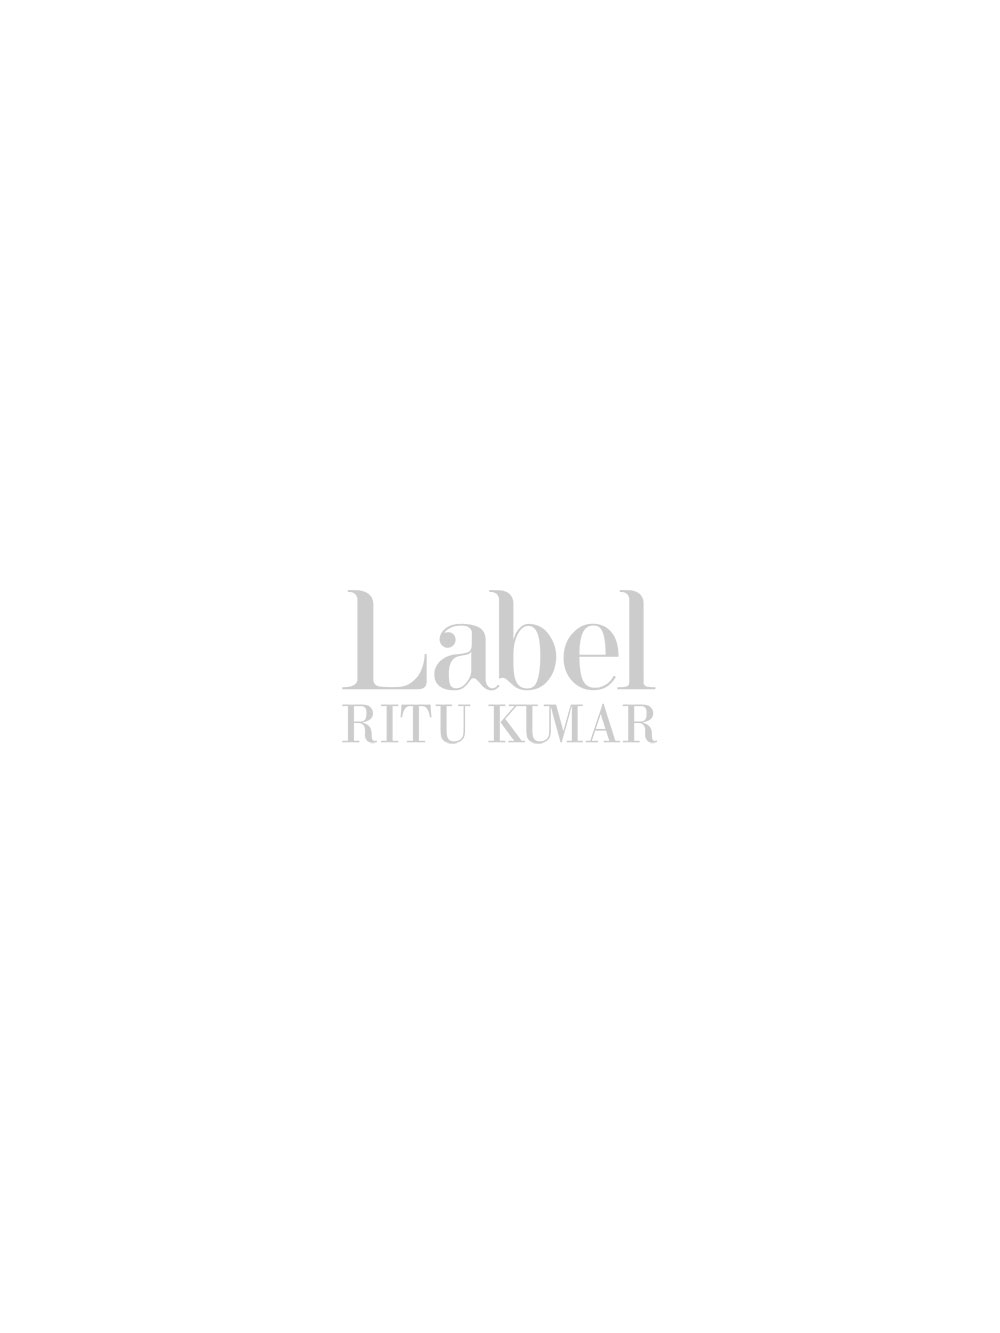 Red Chiffon Scarf by Label Ritu Kumar